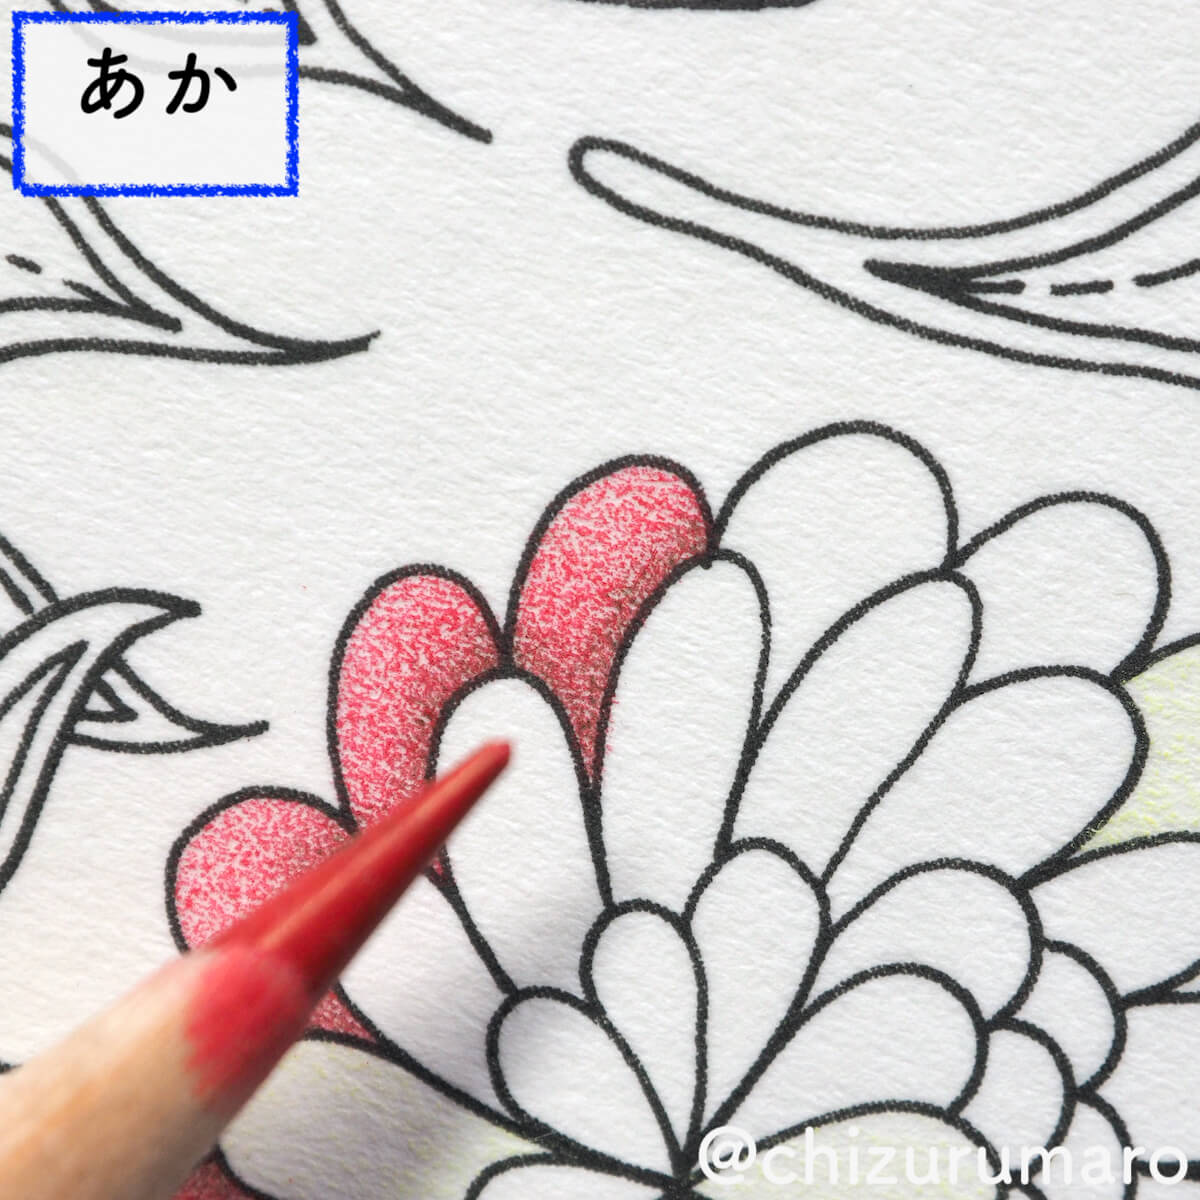 f:id:chizurumaro:20200511124922j:plain